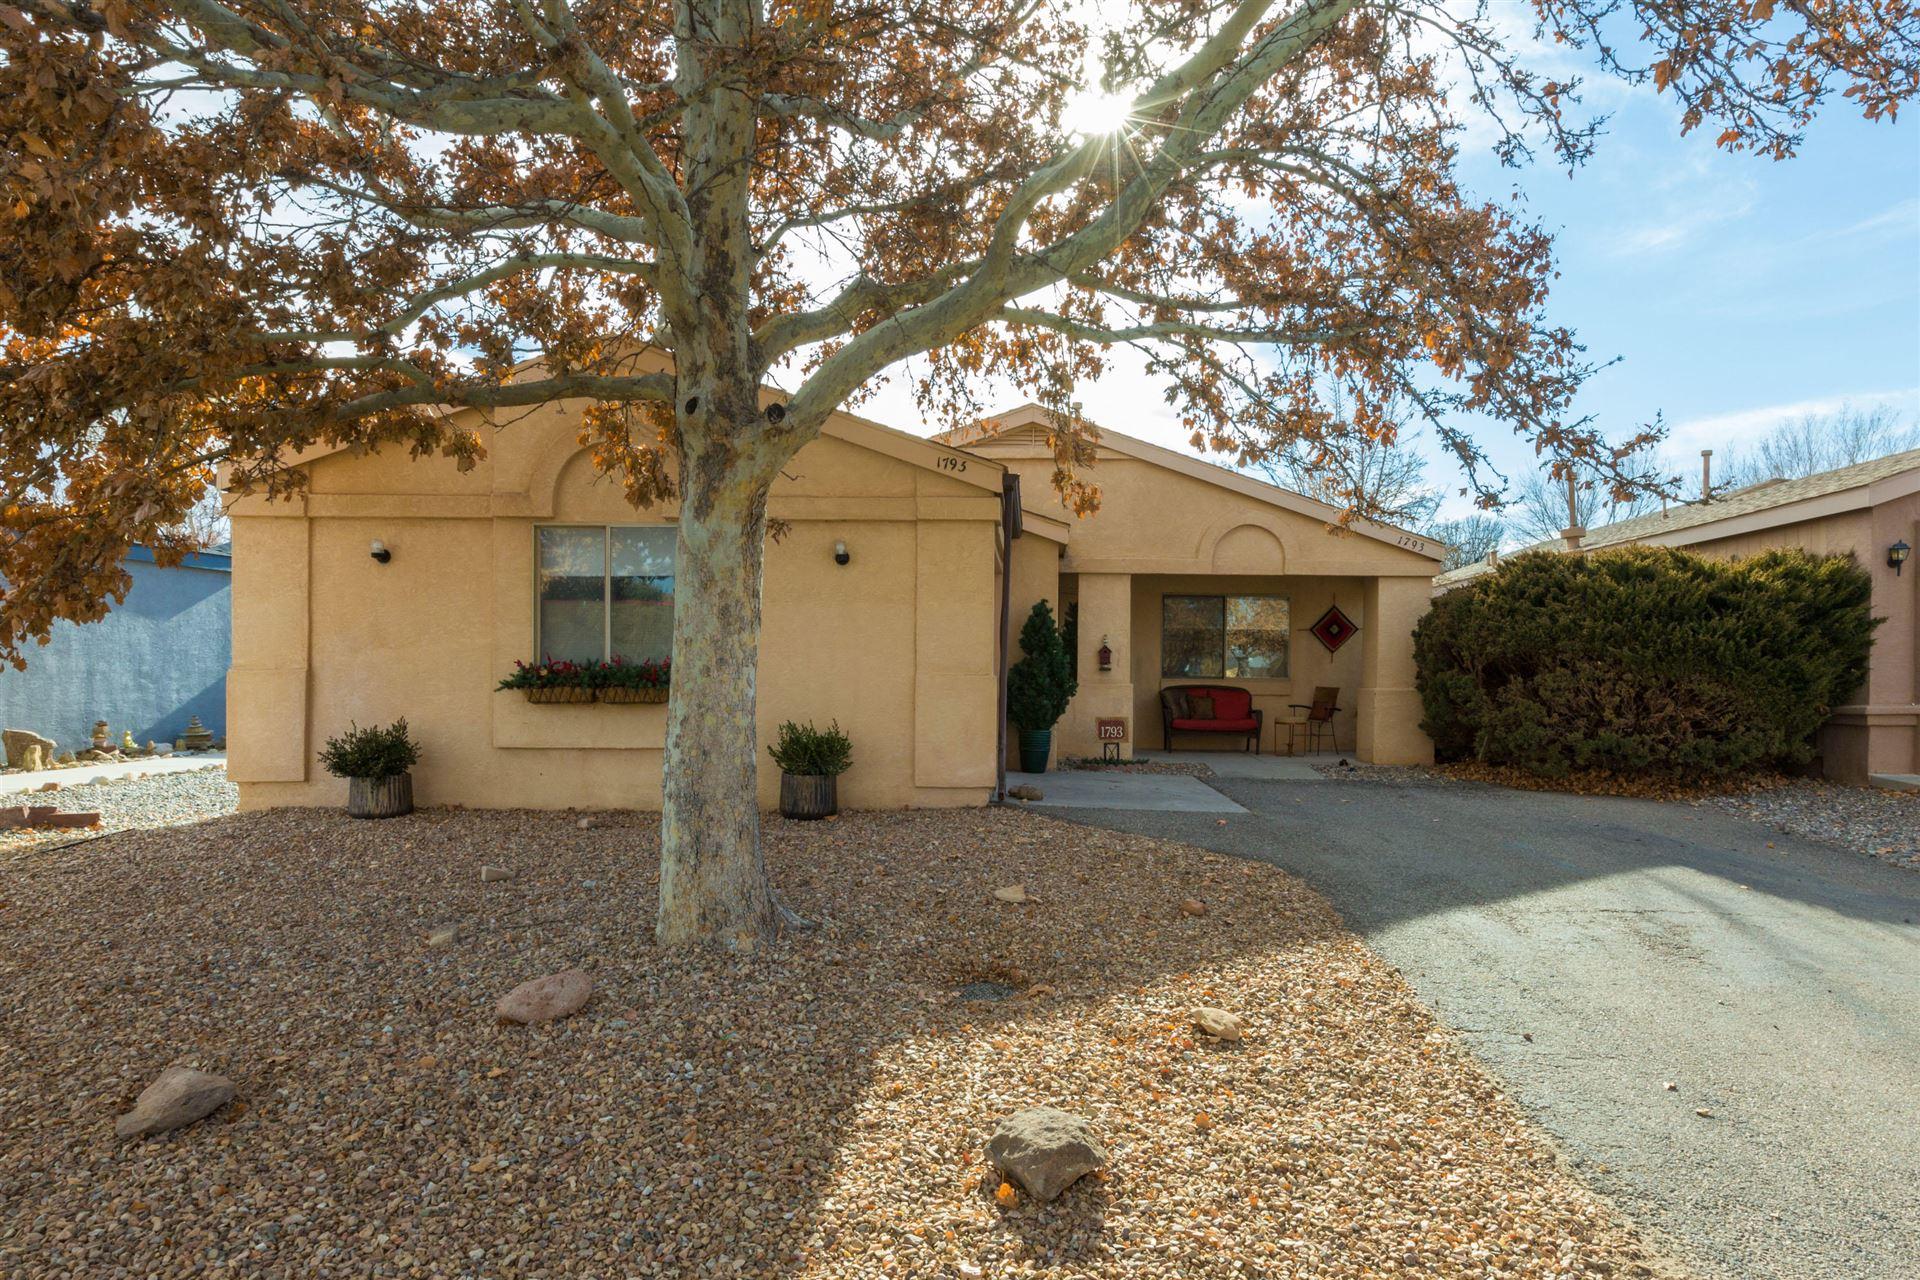 1793 JEFFREY Road NE, Rio Rancho, NM 87144 - MLS#: 984902